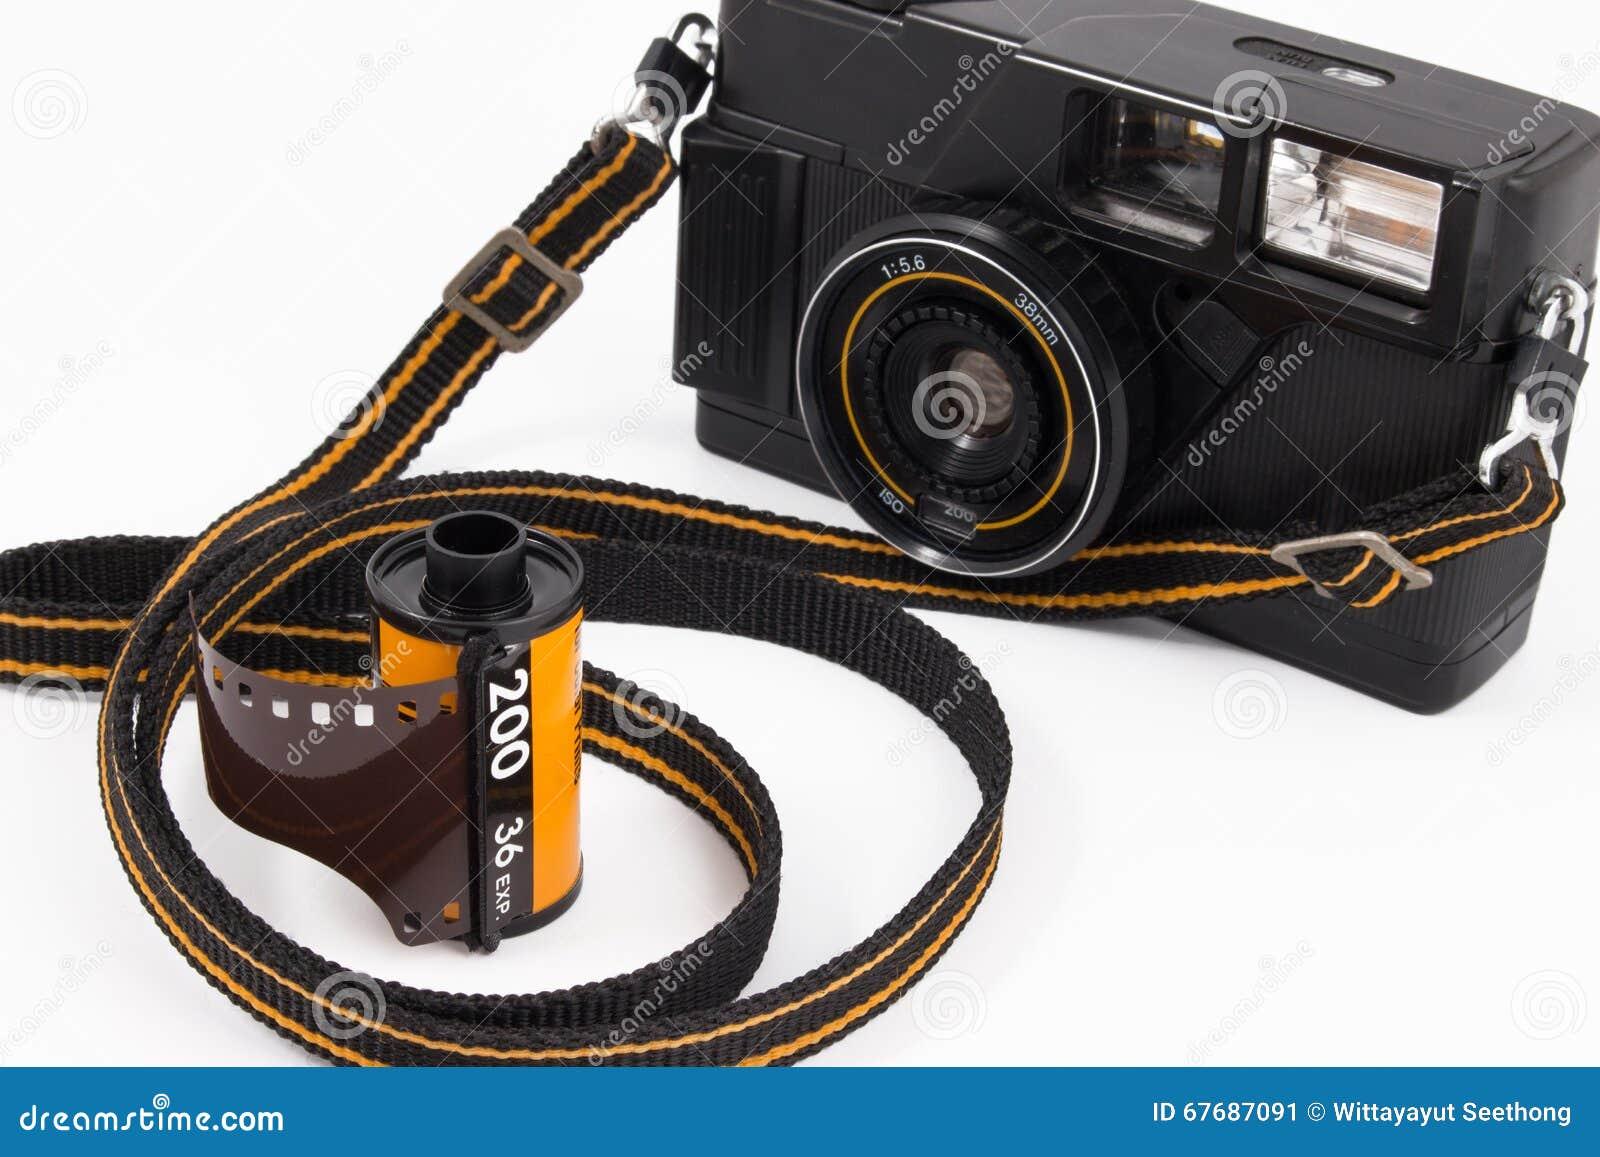 snimaet-na-kameru-video-volosatenkie